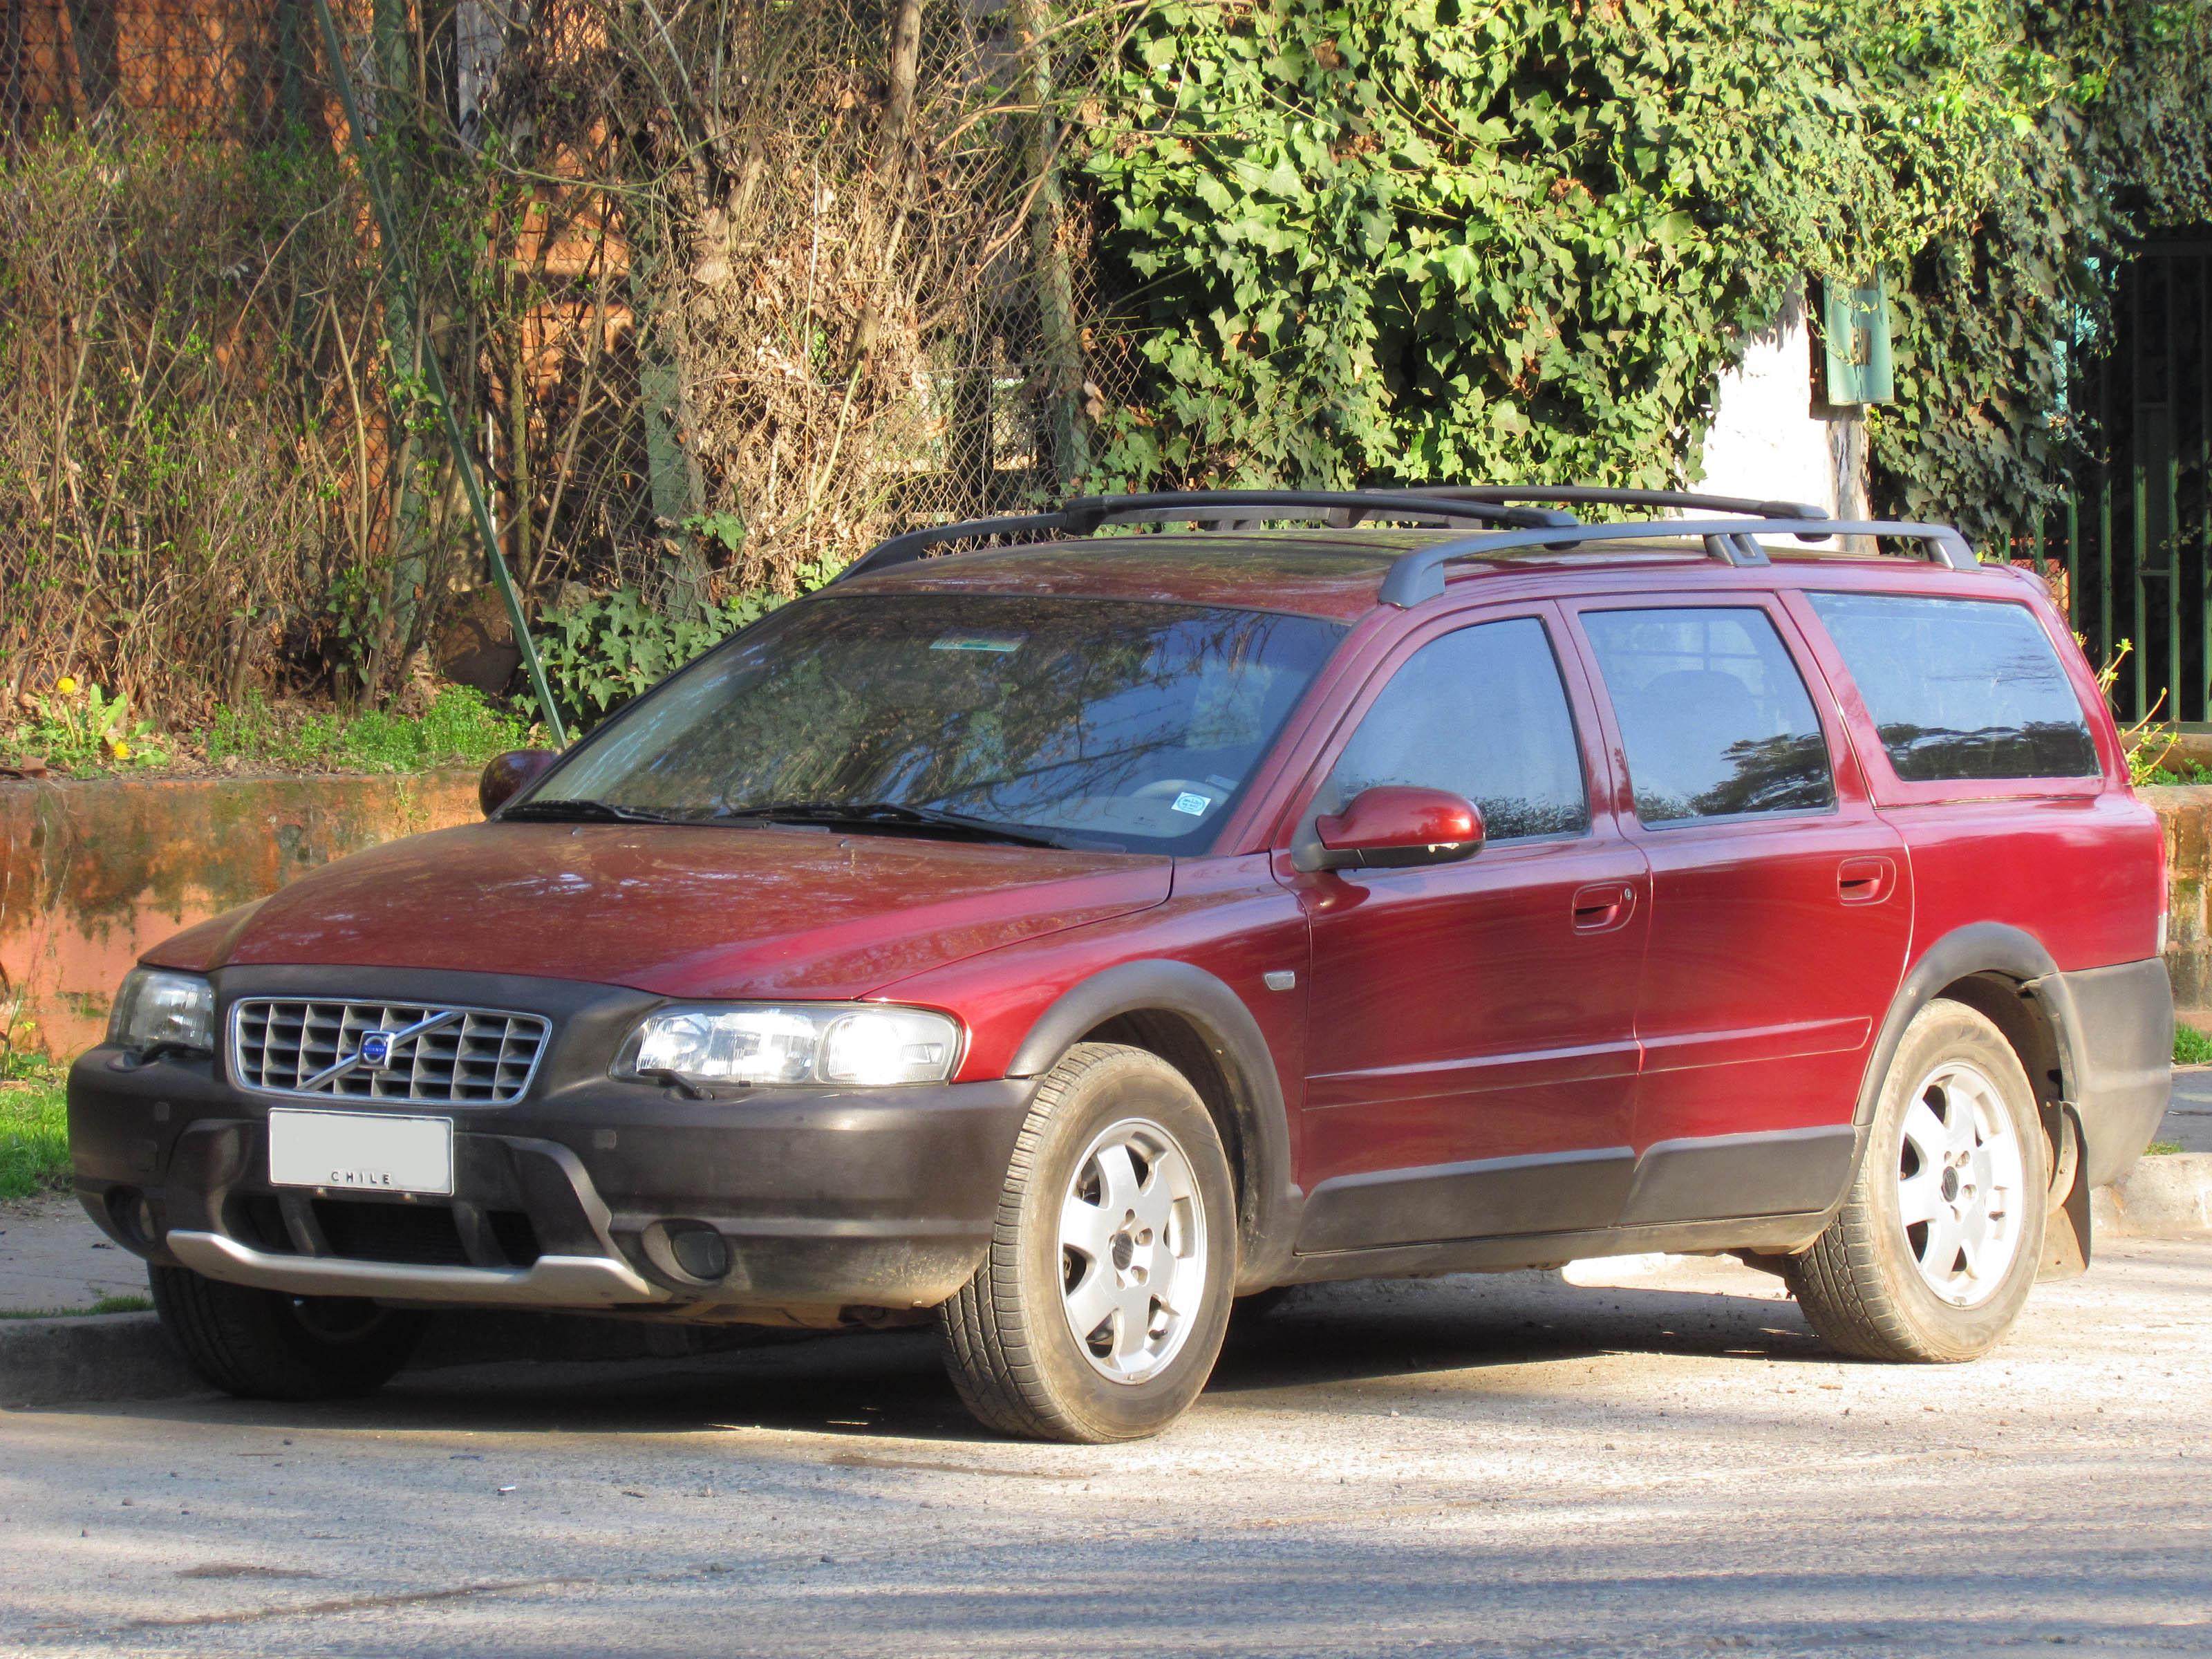 File:Volvo V70 XC Cross Country 2002 (10845514474).jpg - Wikimedia Commons